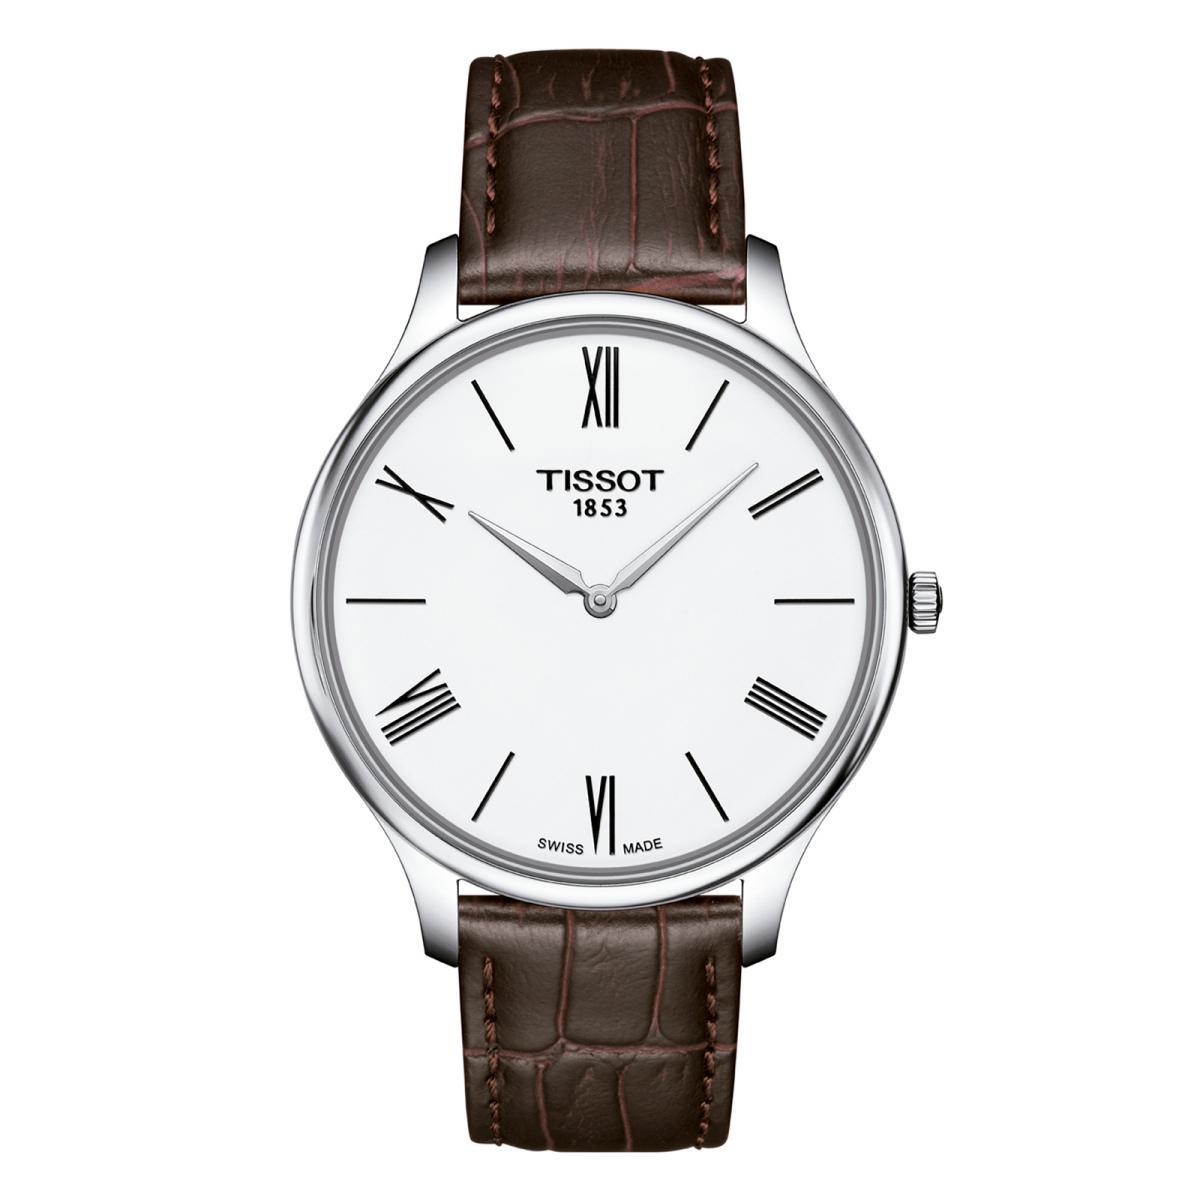 aedc97ae8dc0 Reloj Tissot - T063.409.16.018.00 - HOMBRE - Time Square